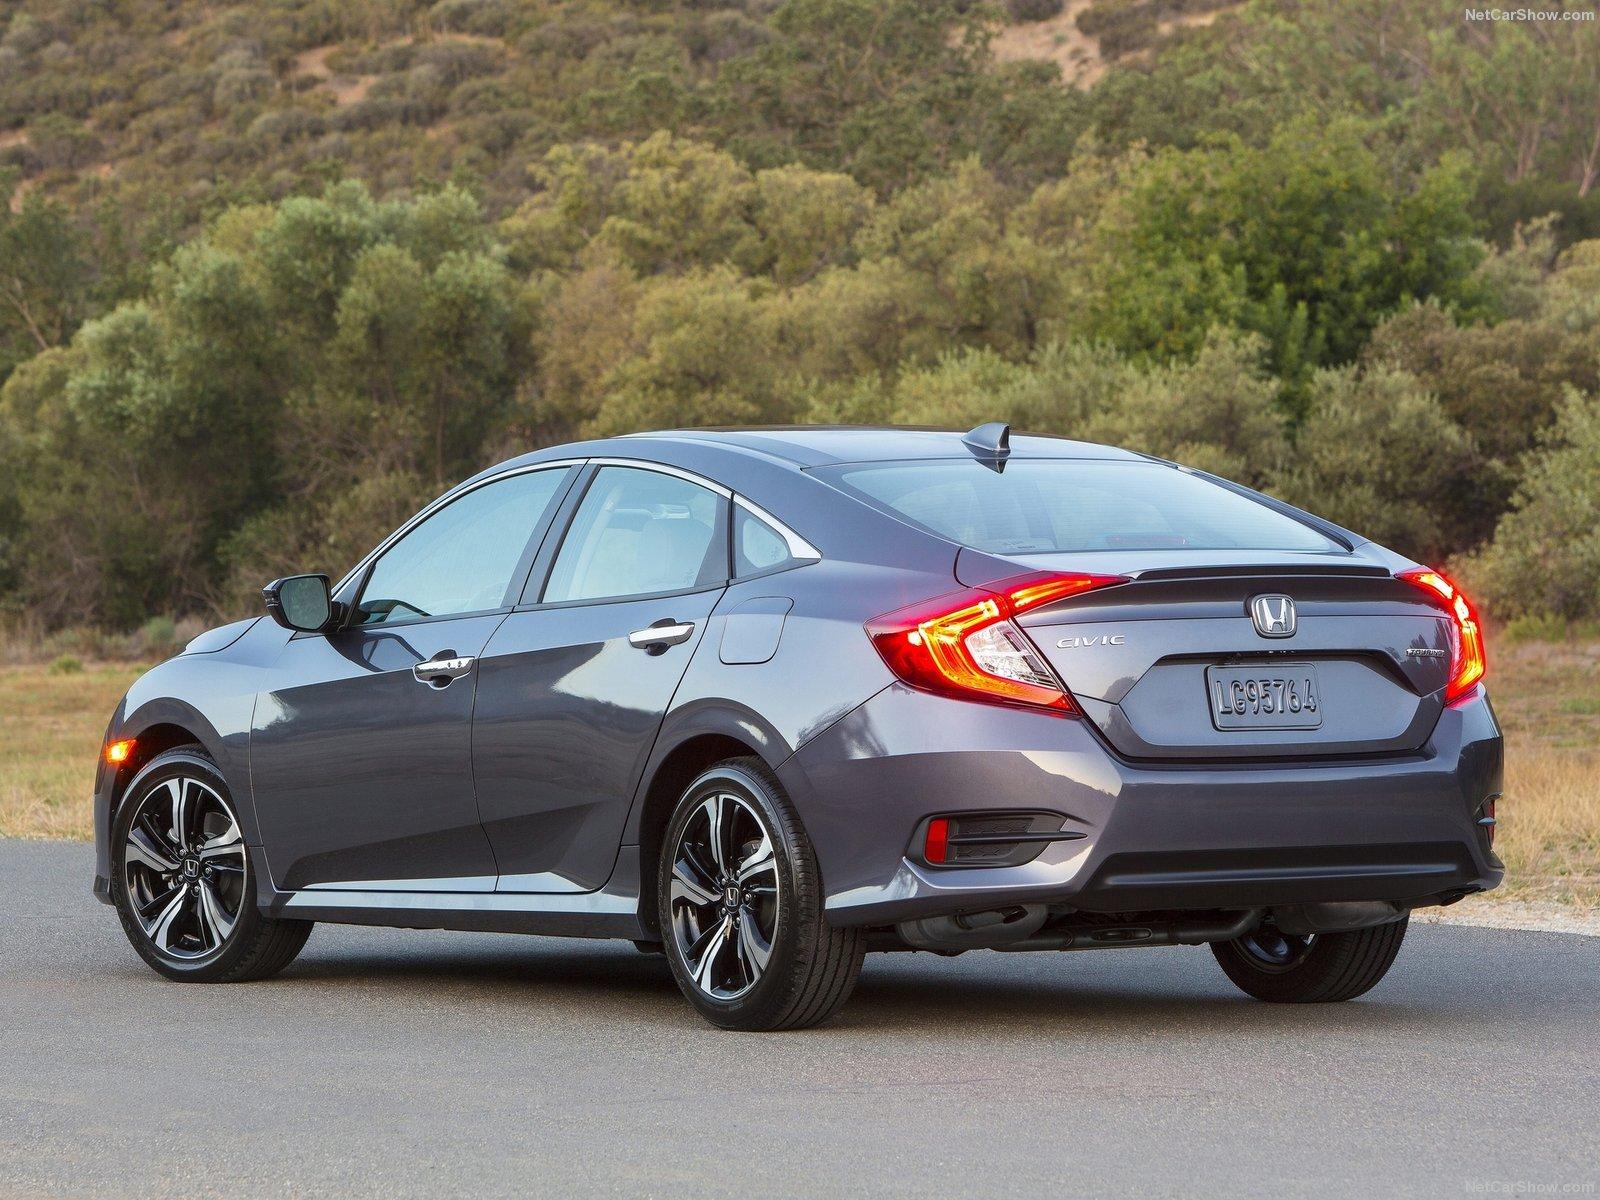 Honda Civic Sedan 2016 Back-Best Selling Cars